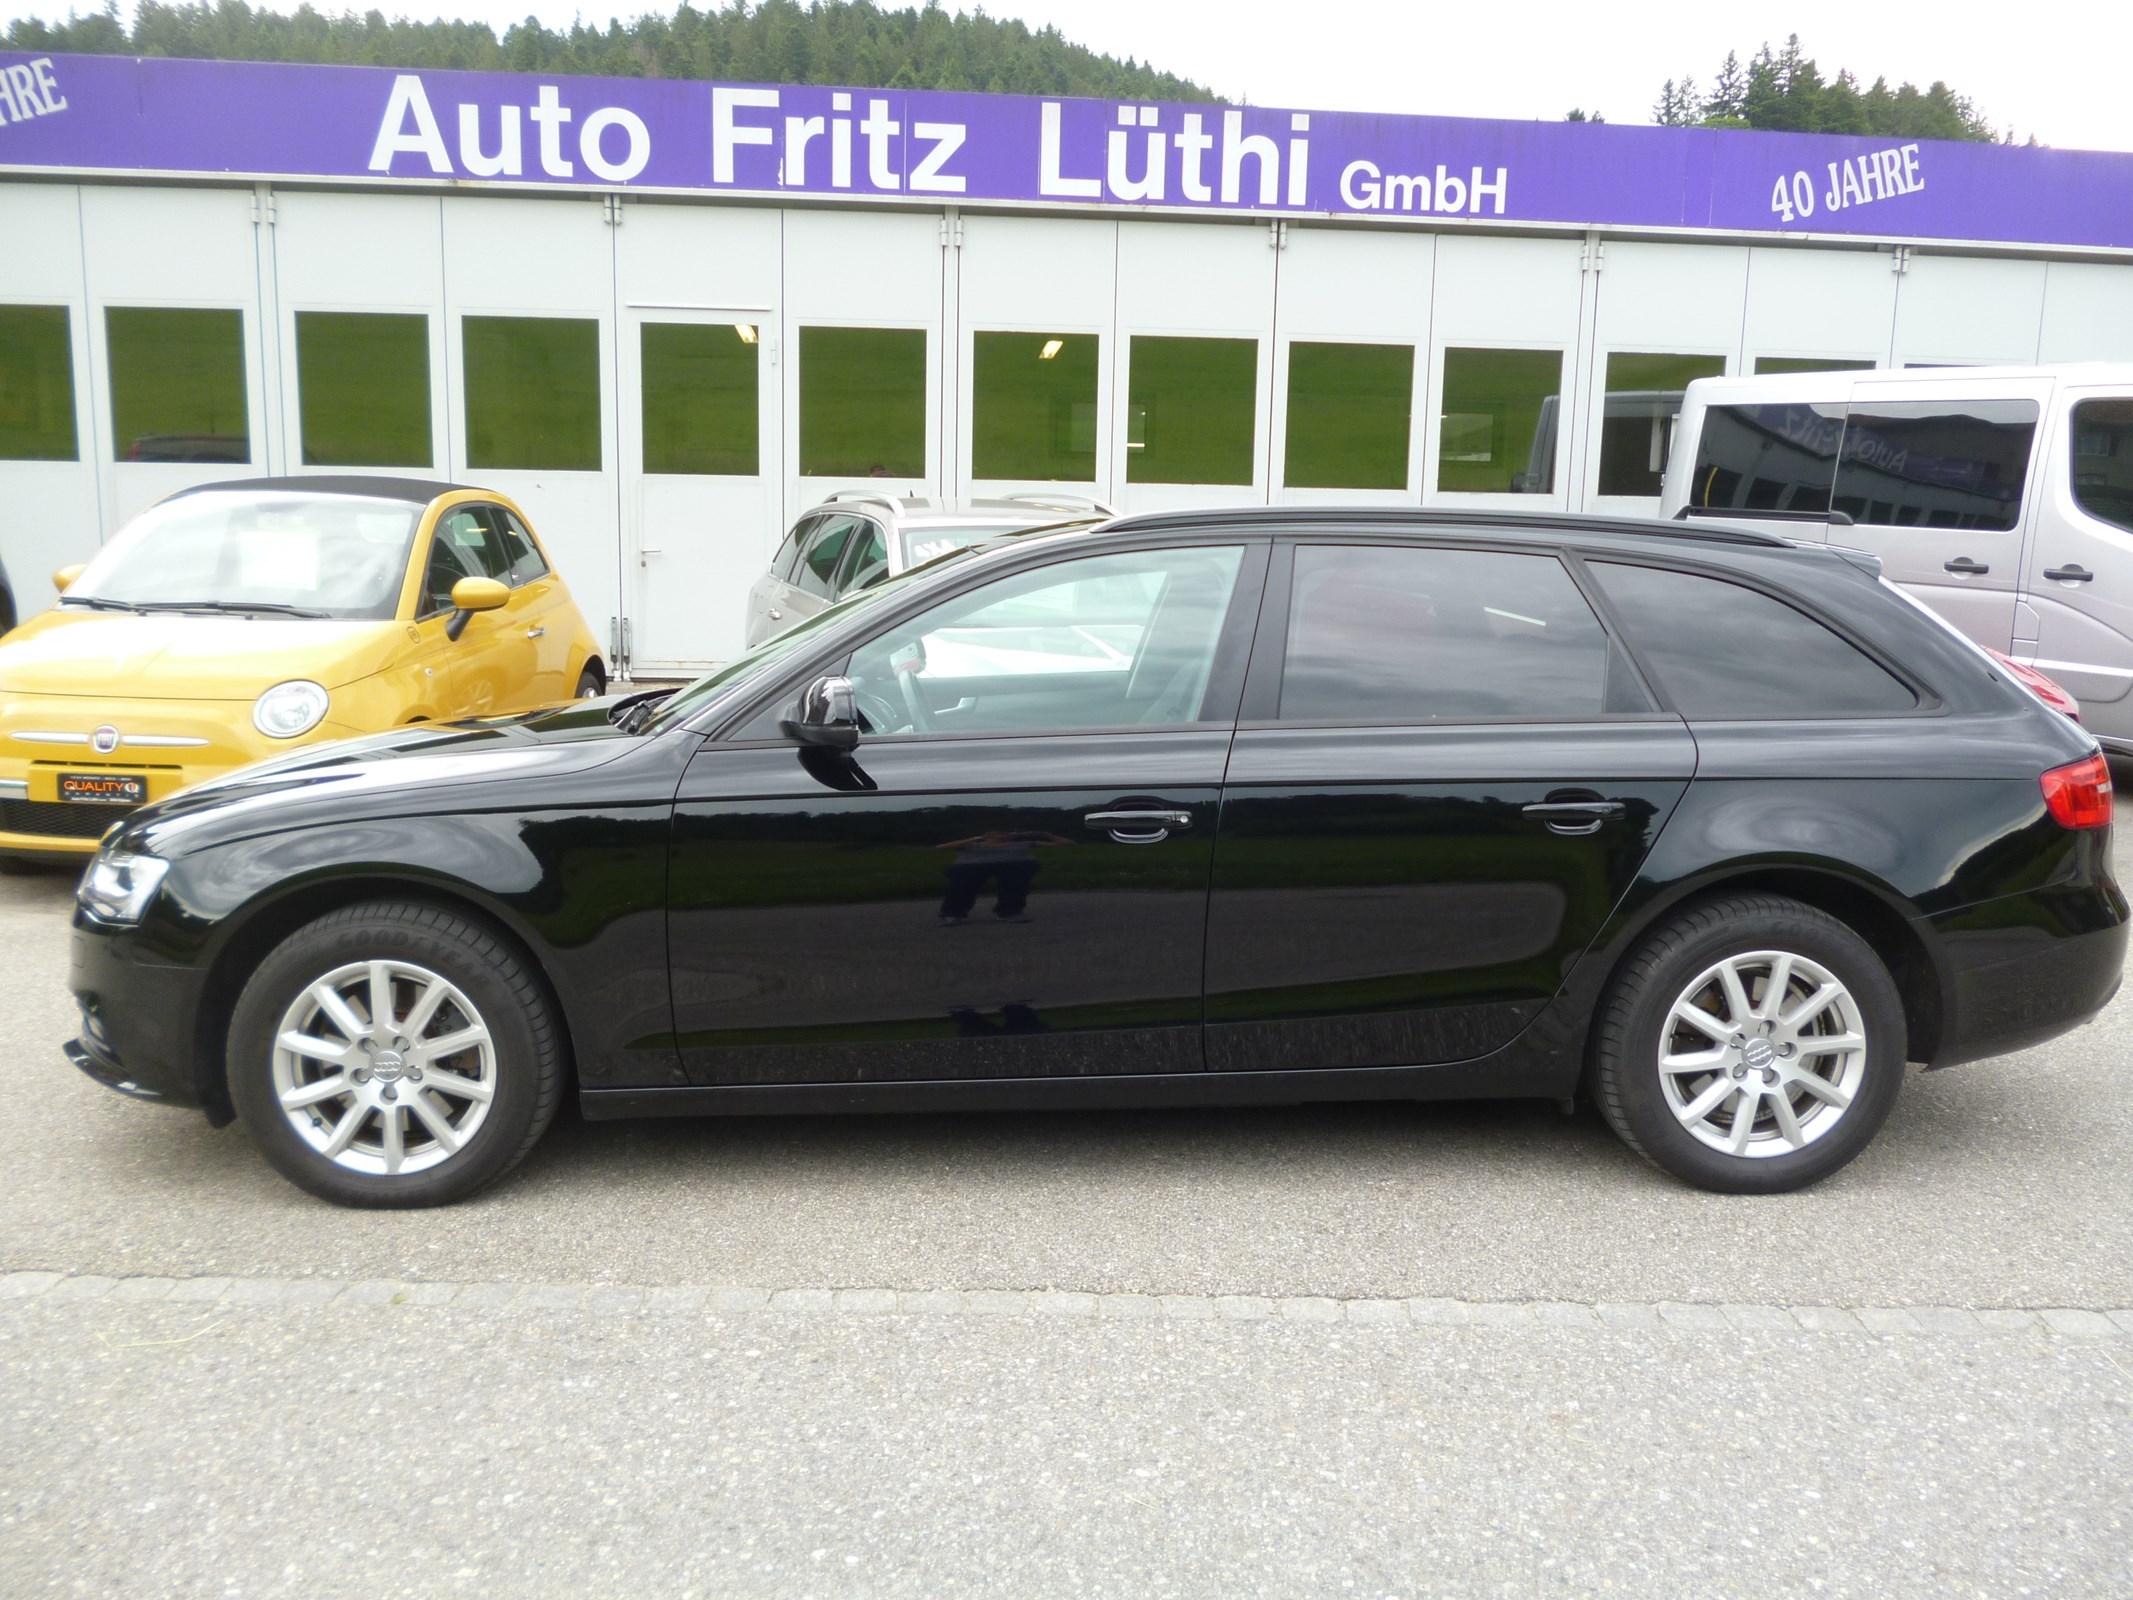 estate Audi A4 Avant 2.0 TDI 177 M-Tronic